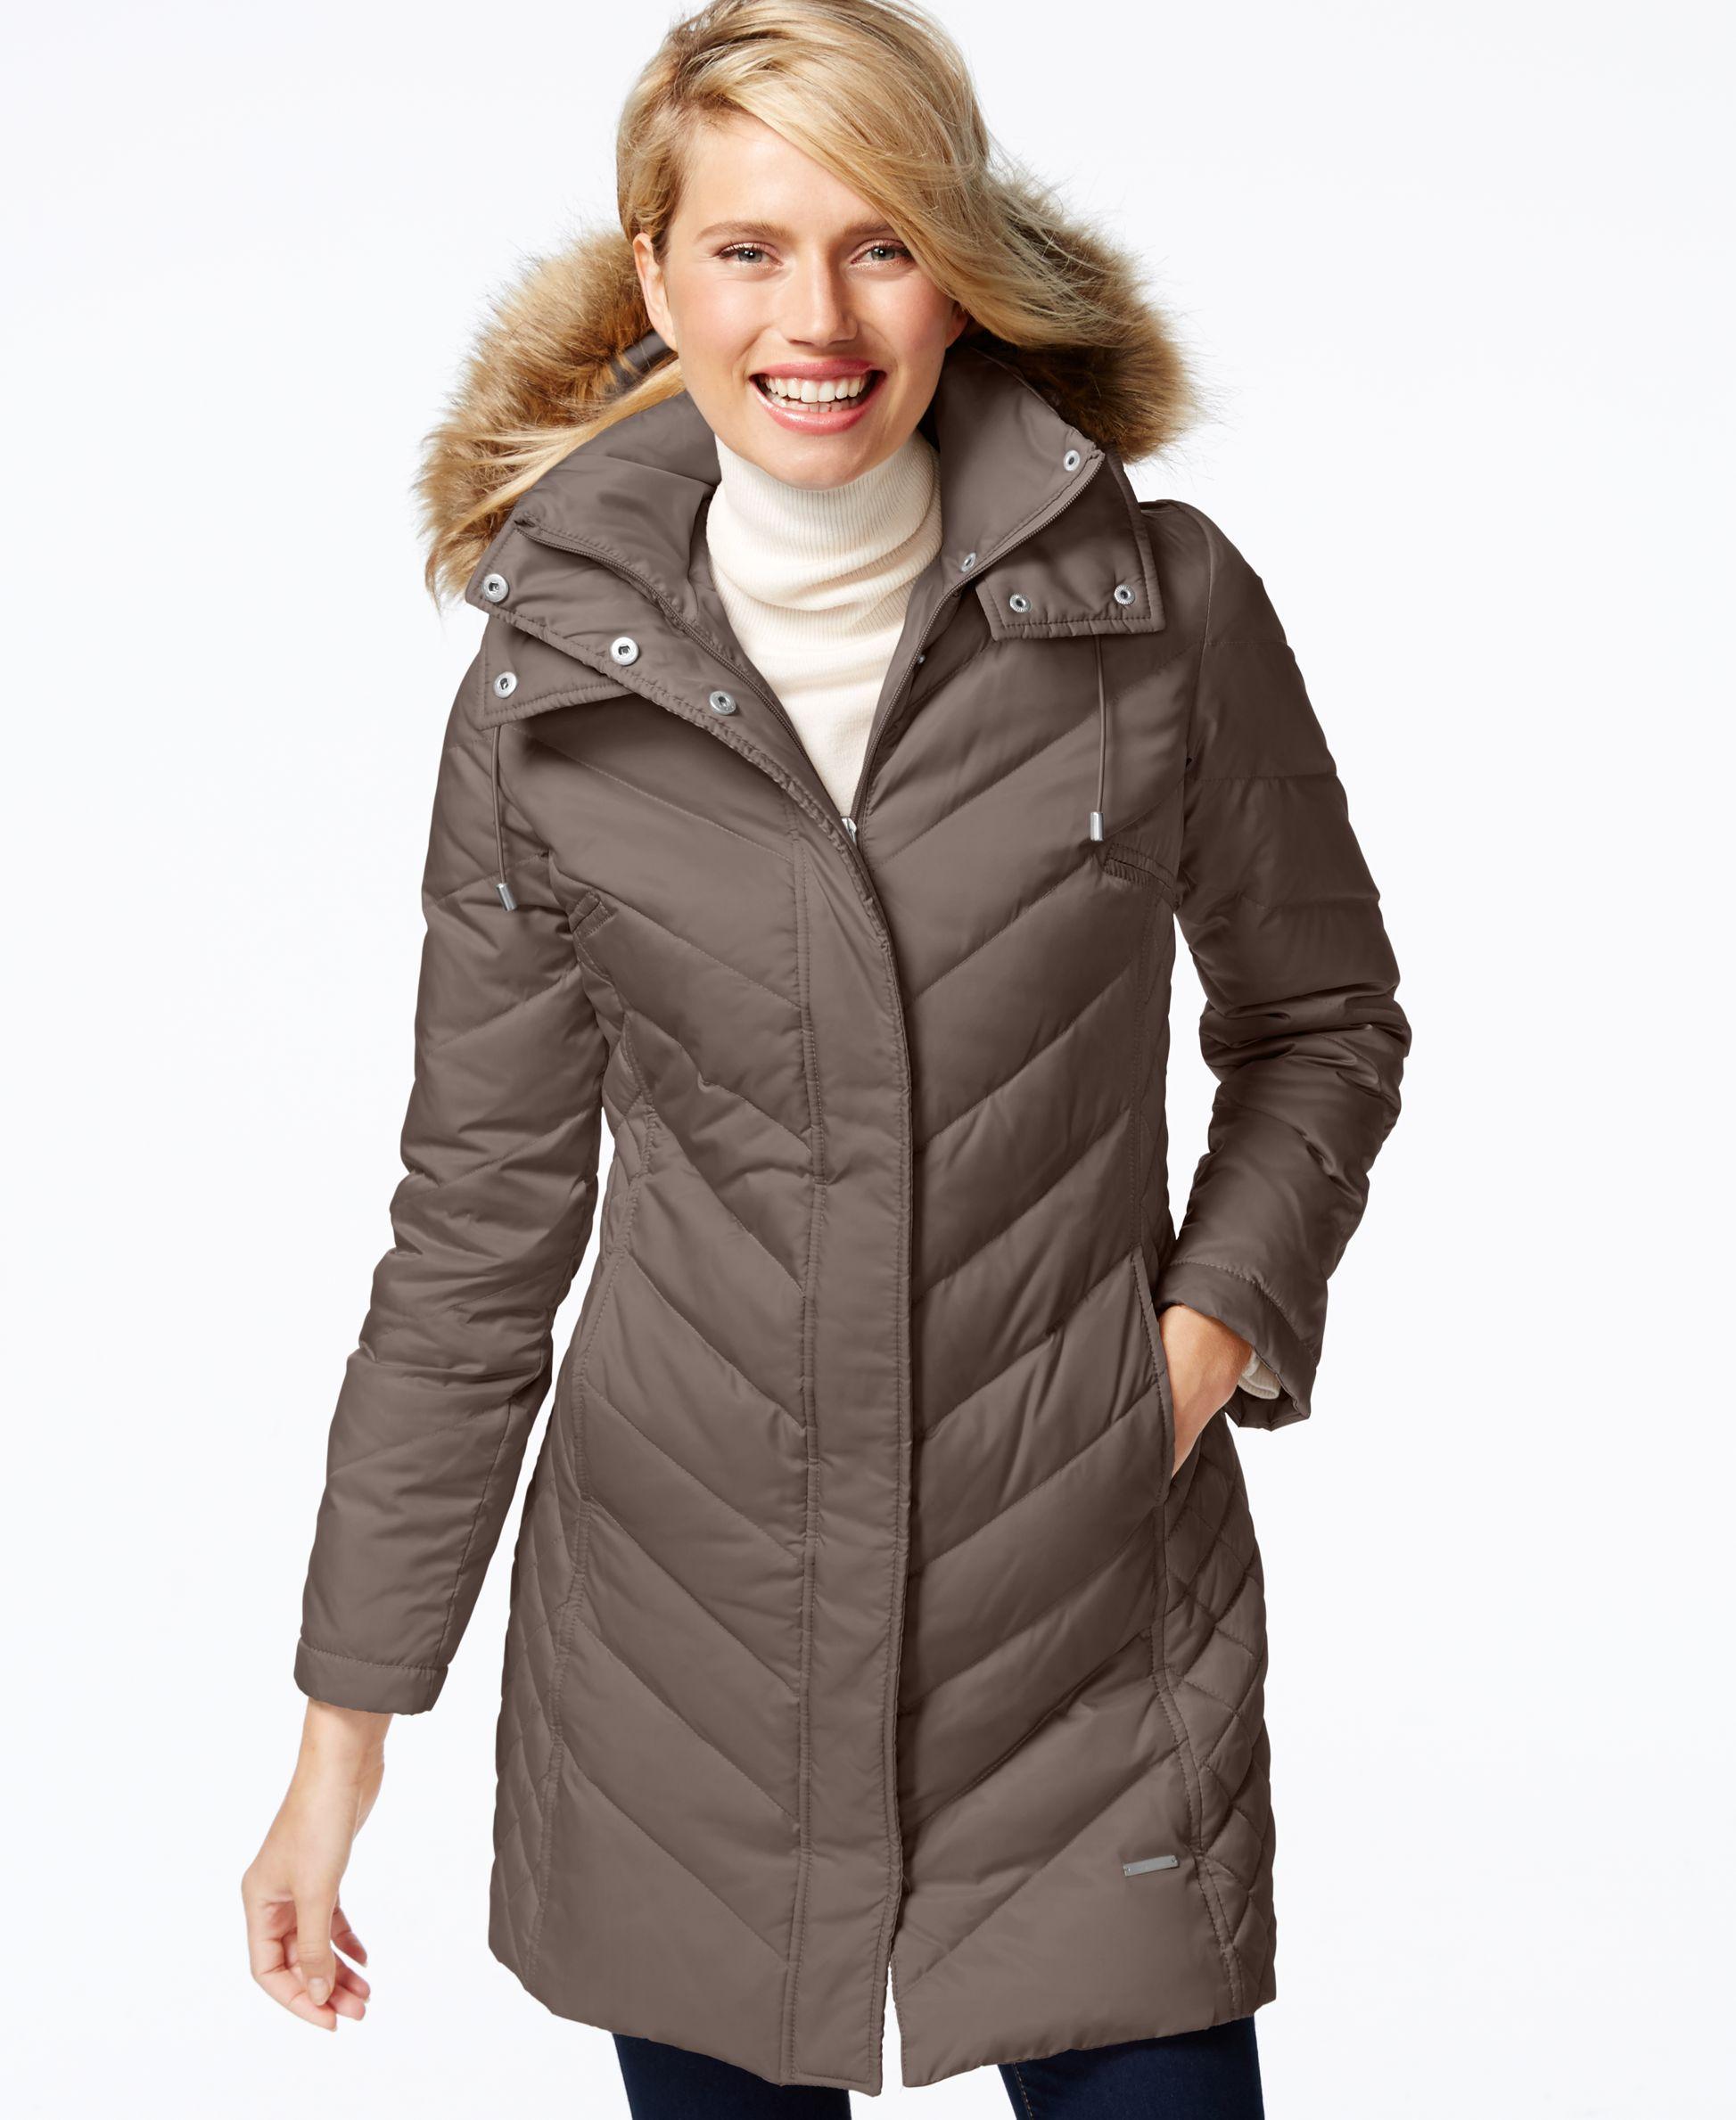 Kenneth Cole Faux-Fur-Trim Chevron Quilted Down Coat | Products ... : kenneth cole chevron quilted coat - Adamdwight.com